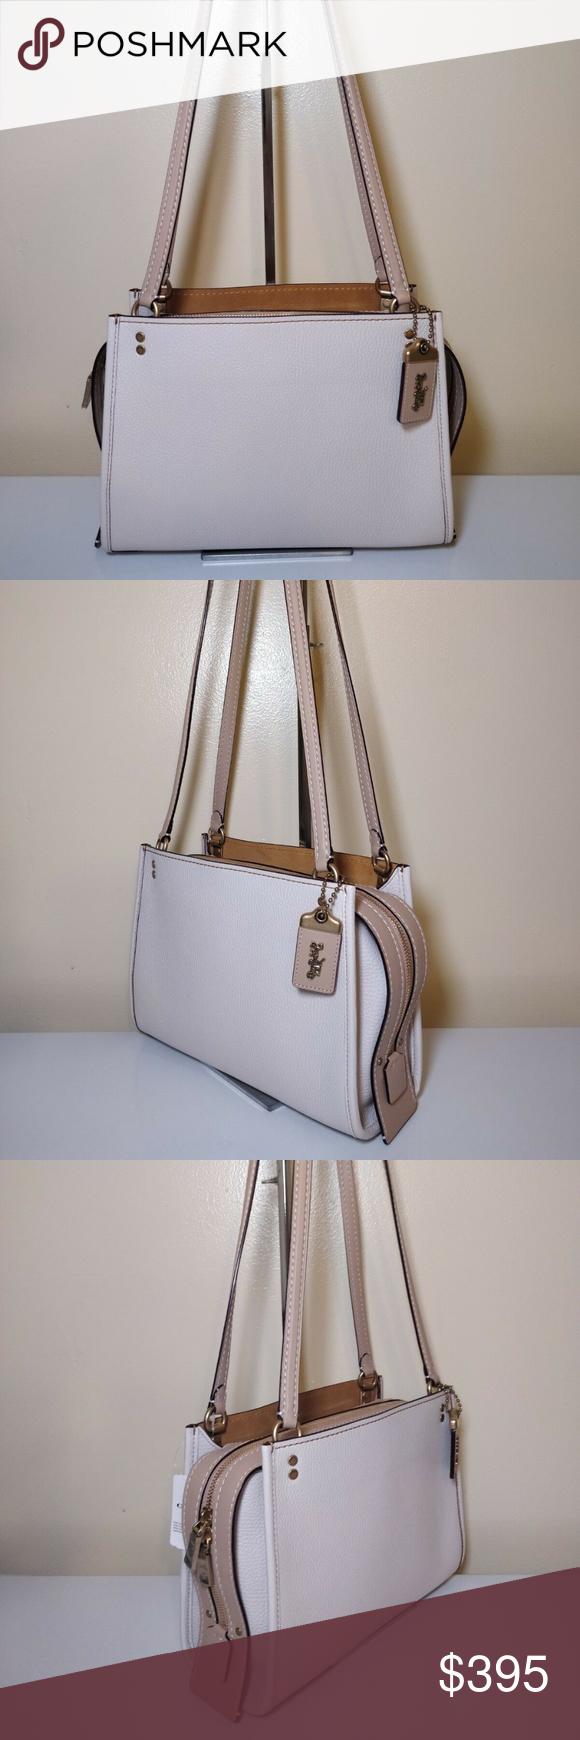 ee54149f1c Coach 1941 Rogue Shoulder Bag Chalk White 28484 New With Tags Coach 1941 Rogue  Shoulder Bag